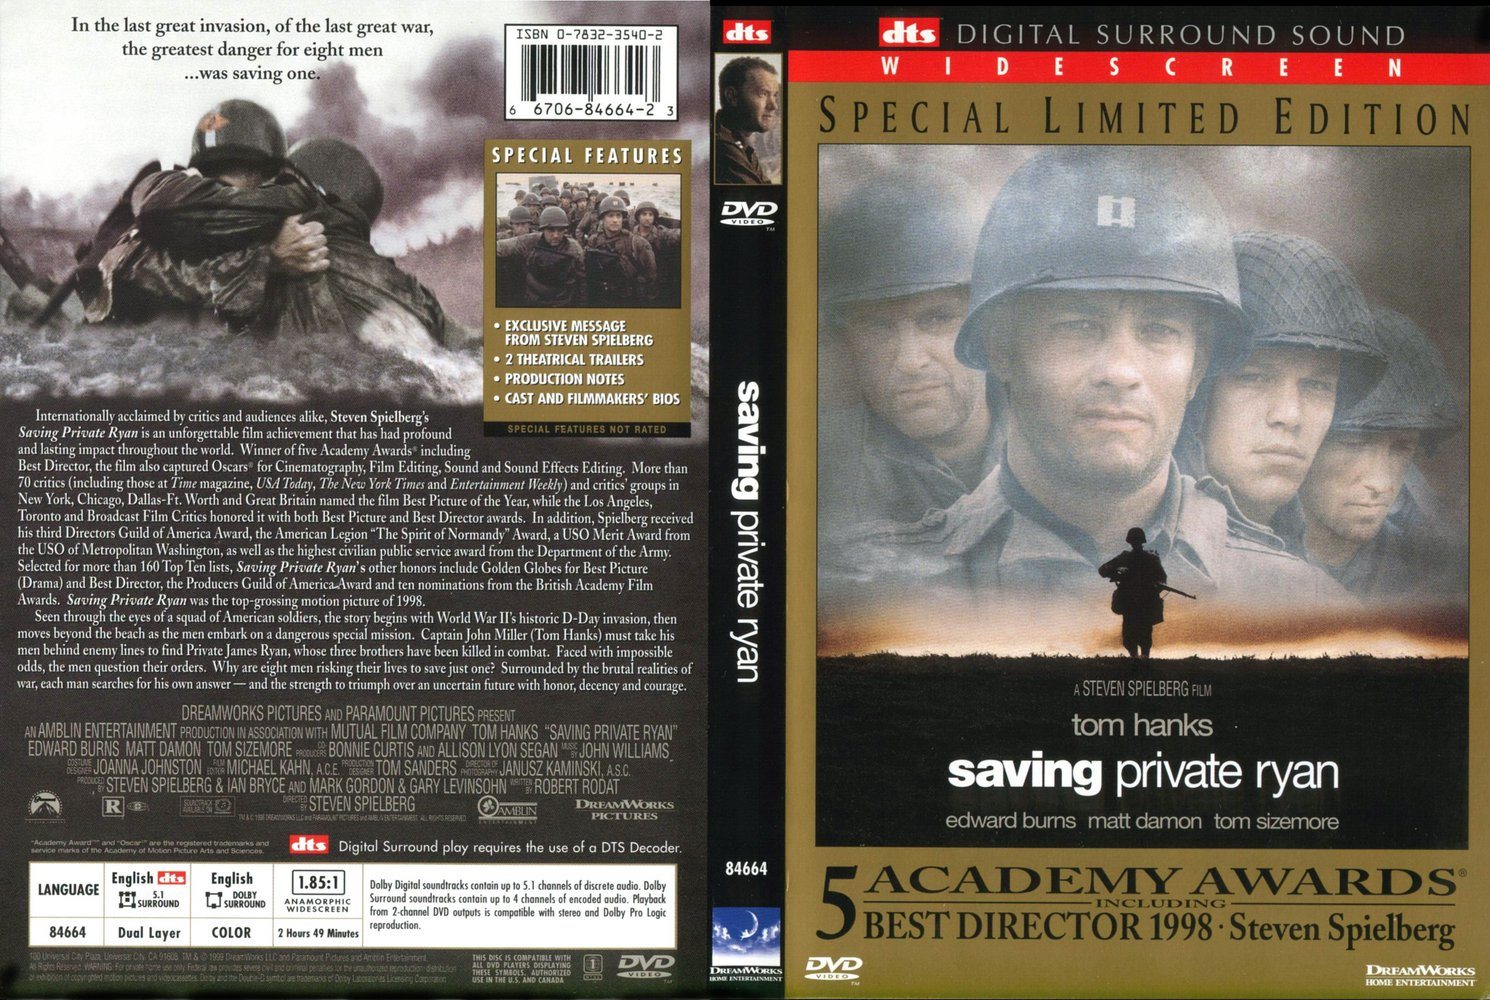 http://2.bp.blogspot.com/_gRRlB9YQM4k/TFBWaimZMeI/AAAAAAAAAR0/1kCAyyXImIc/s1600/Saving_Private_Ryan-%5Bcdcovers_cc%5D-front.jpg